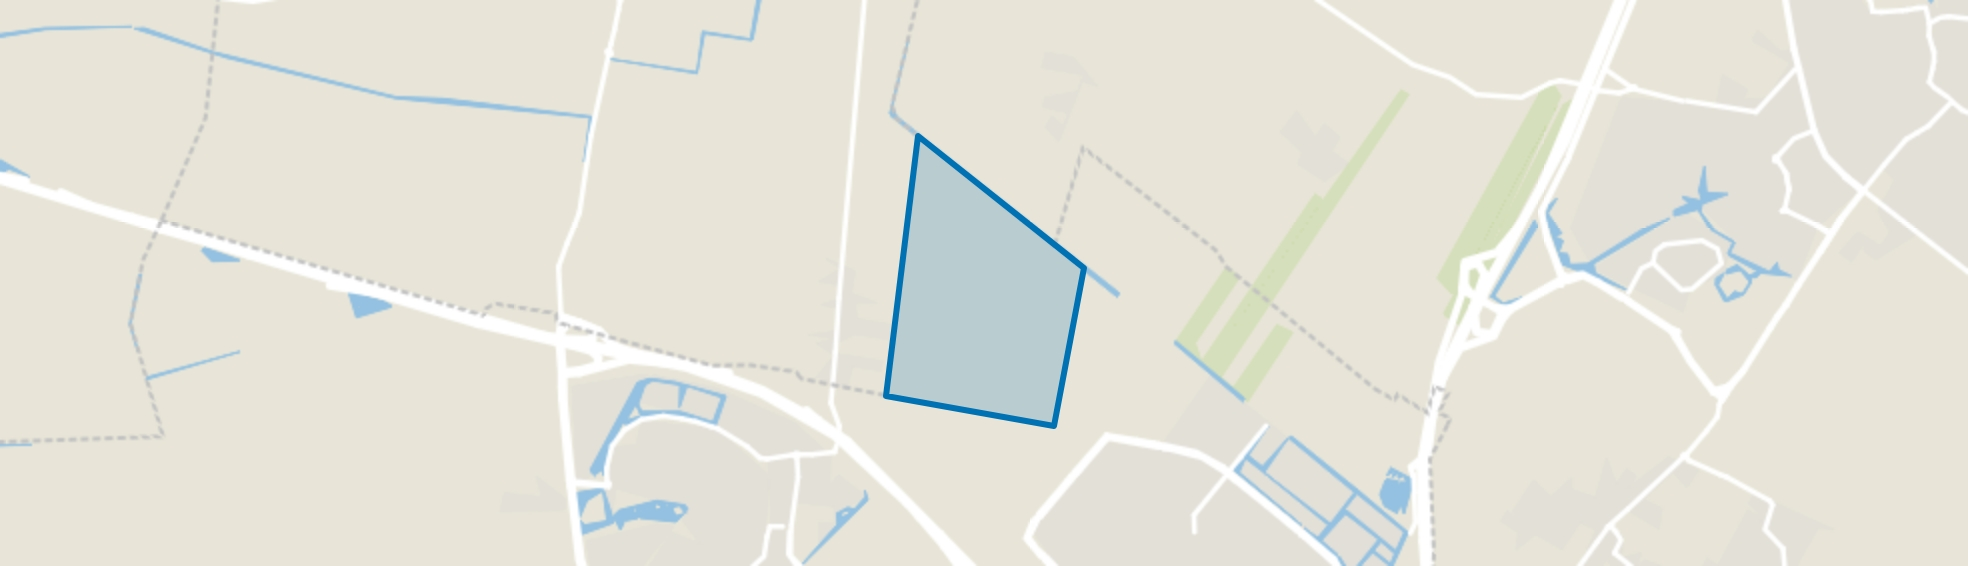 Vathorst-West, Amersfoort map